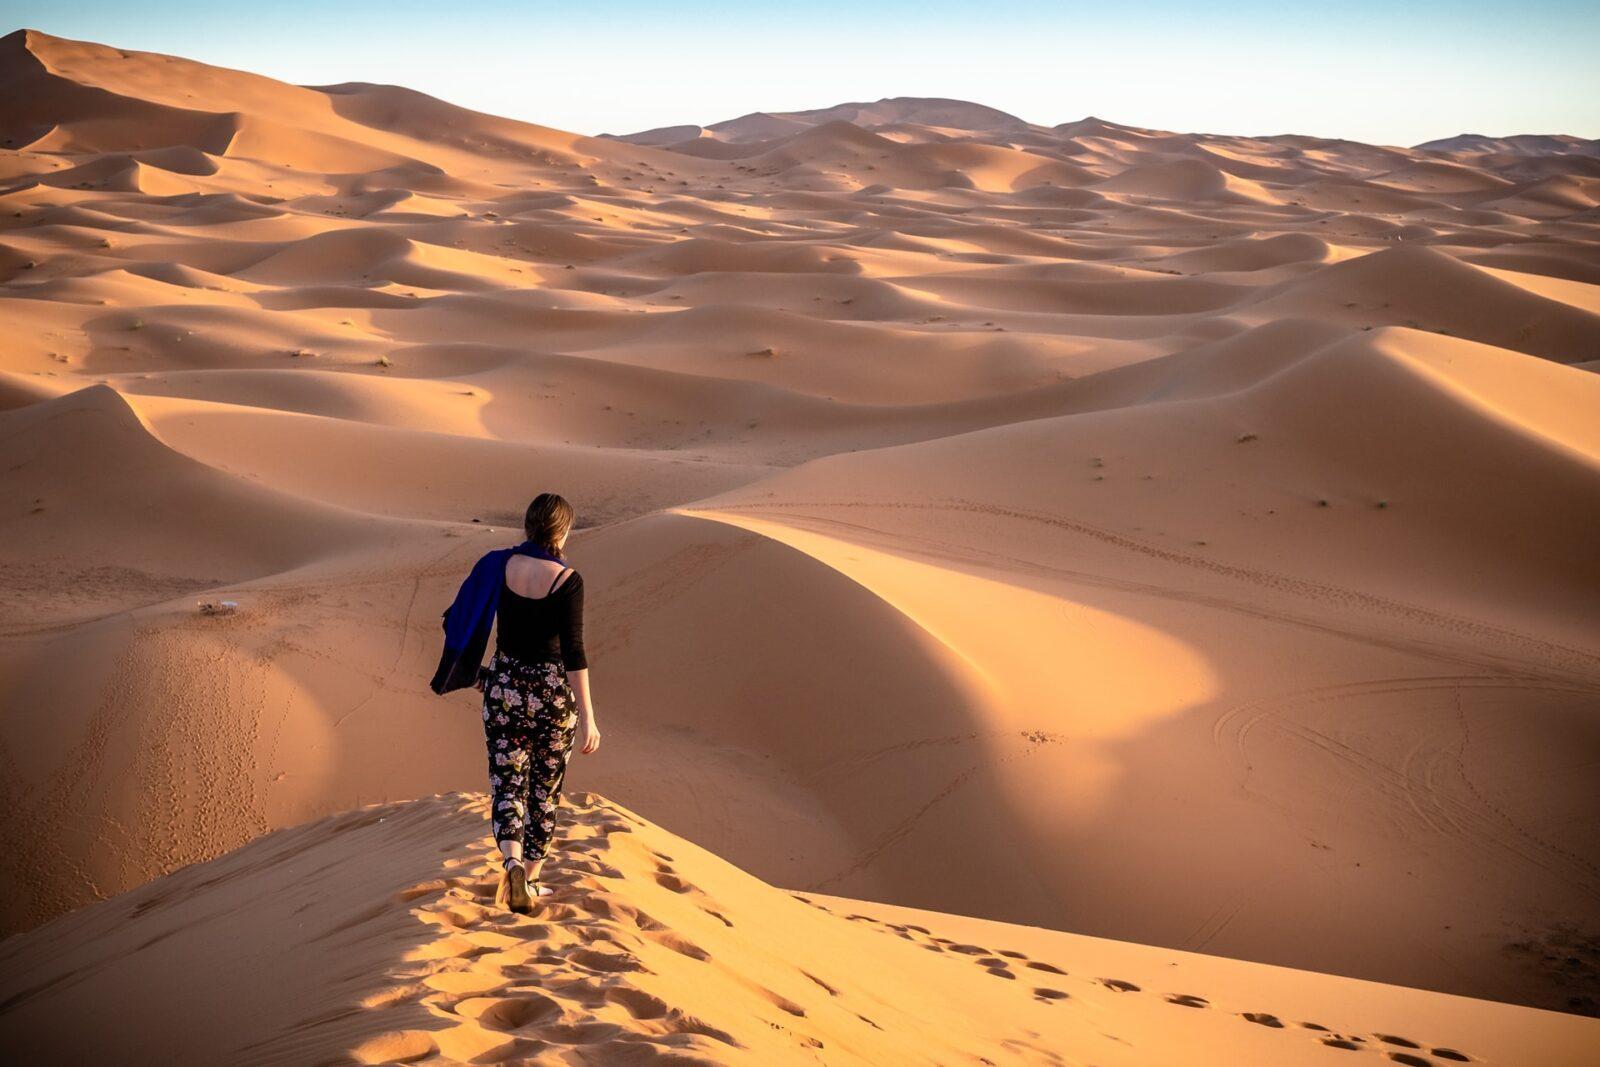 jeff jewiss SMGQ74kB3c unsplash 2 1536x1024 - Guide Morocco Tours